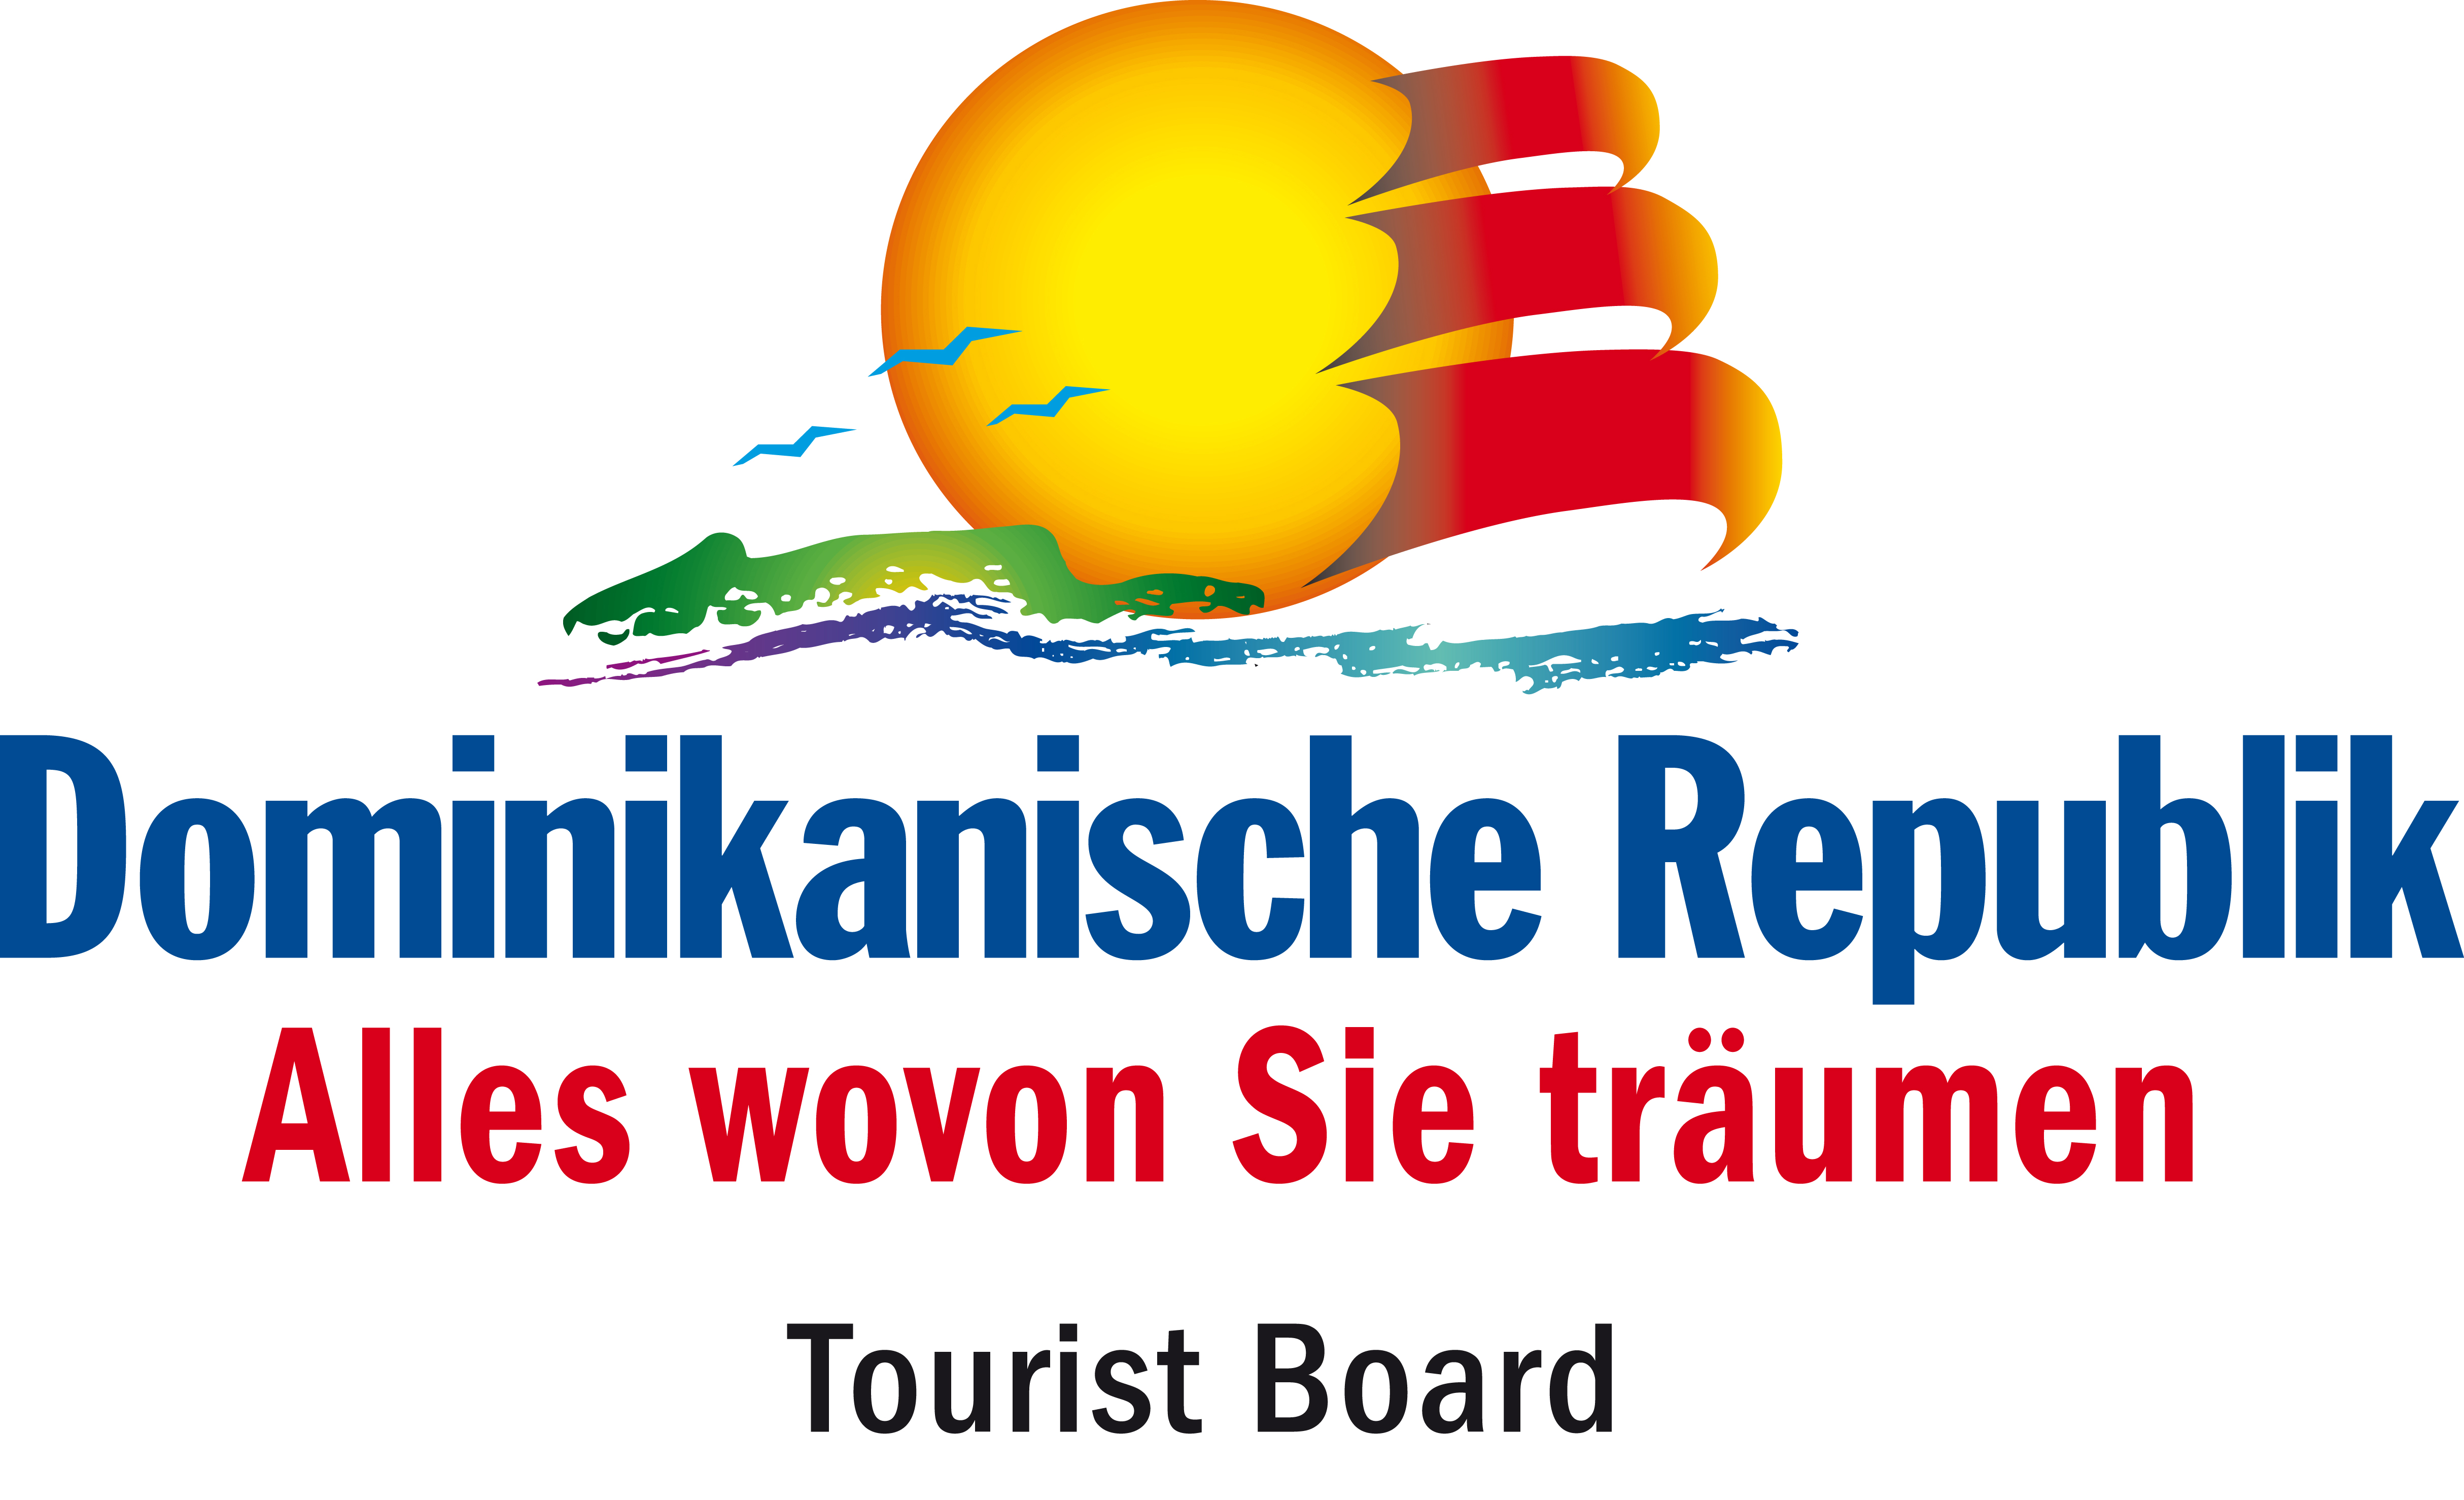 Logo Aleman oficina ingles